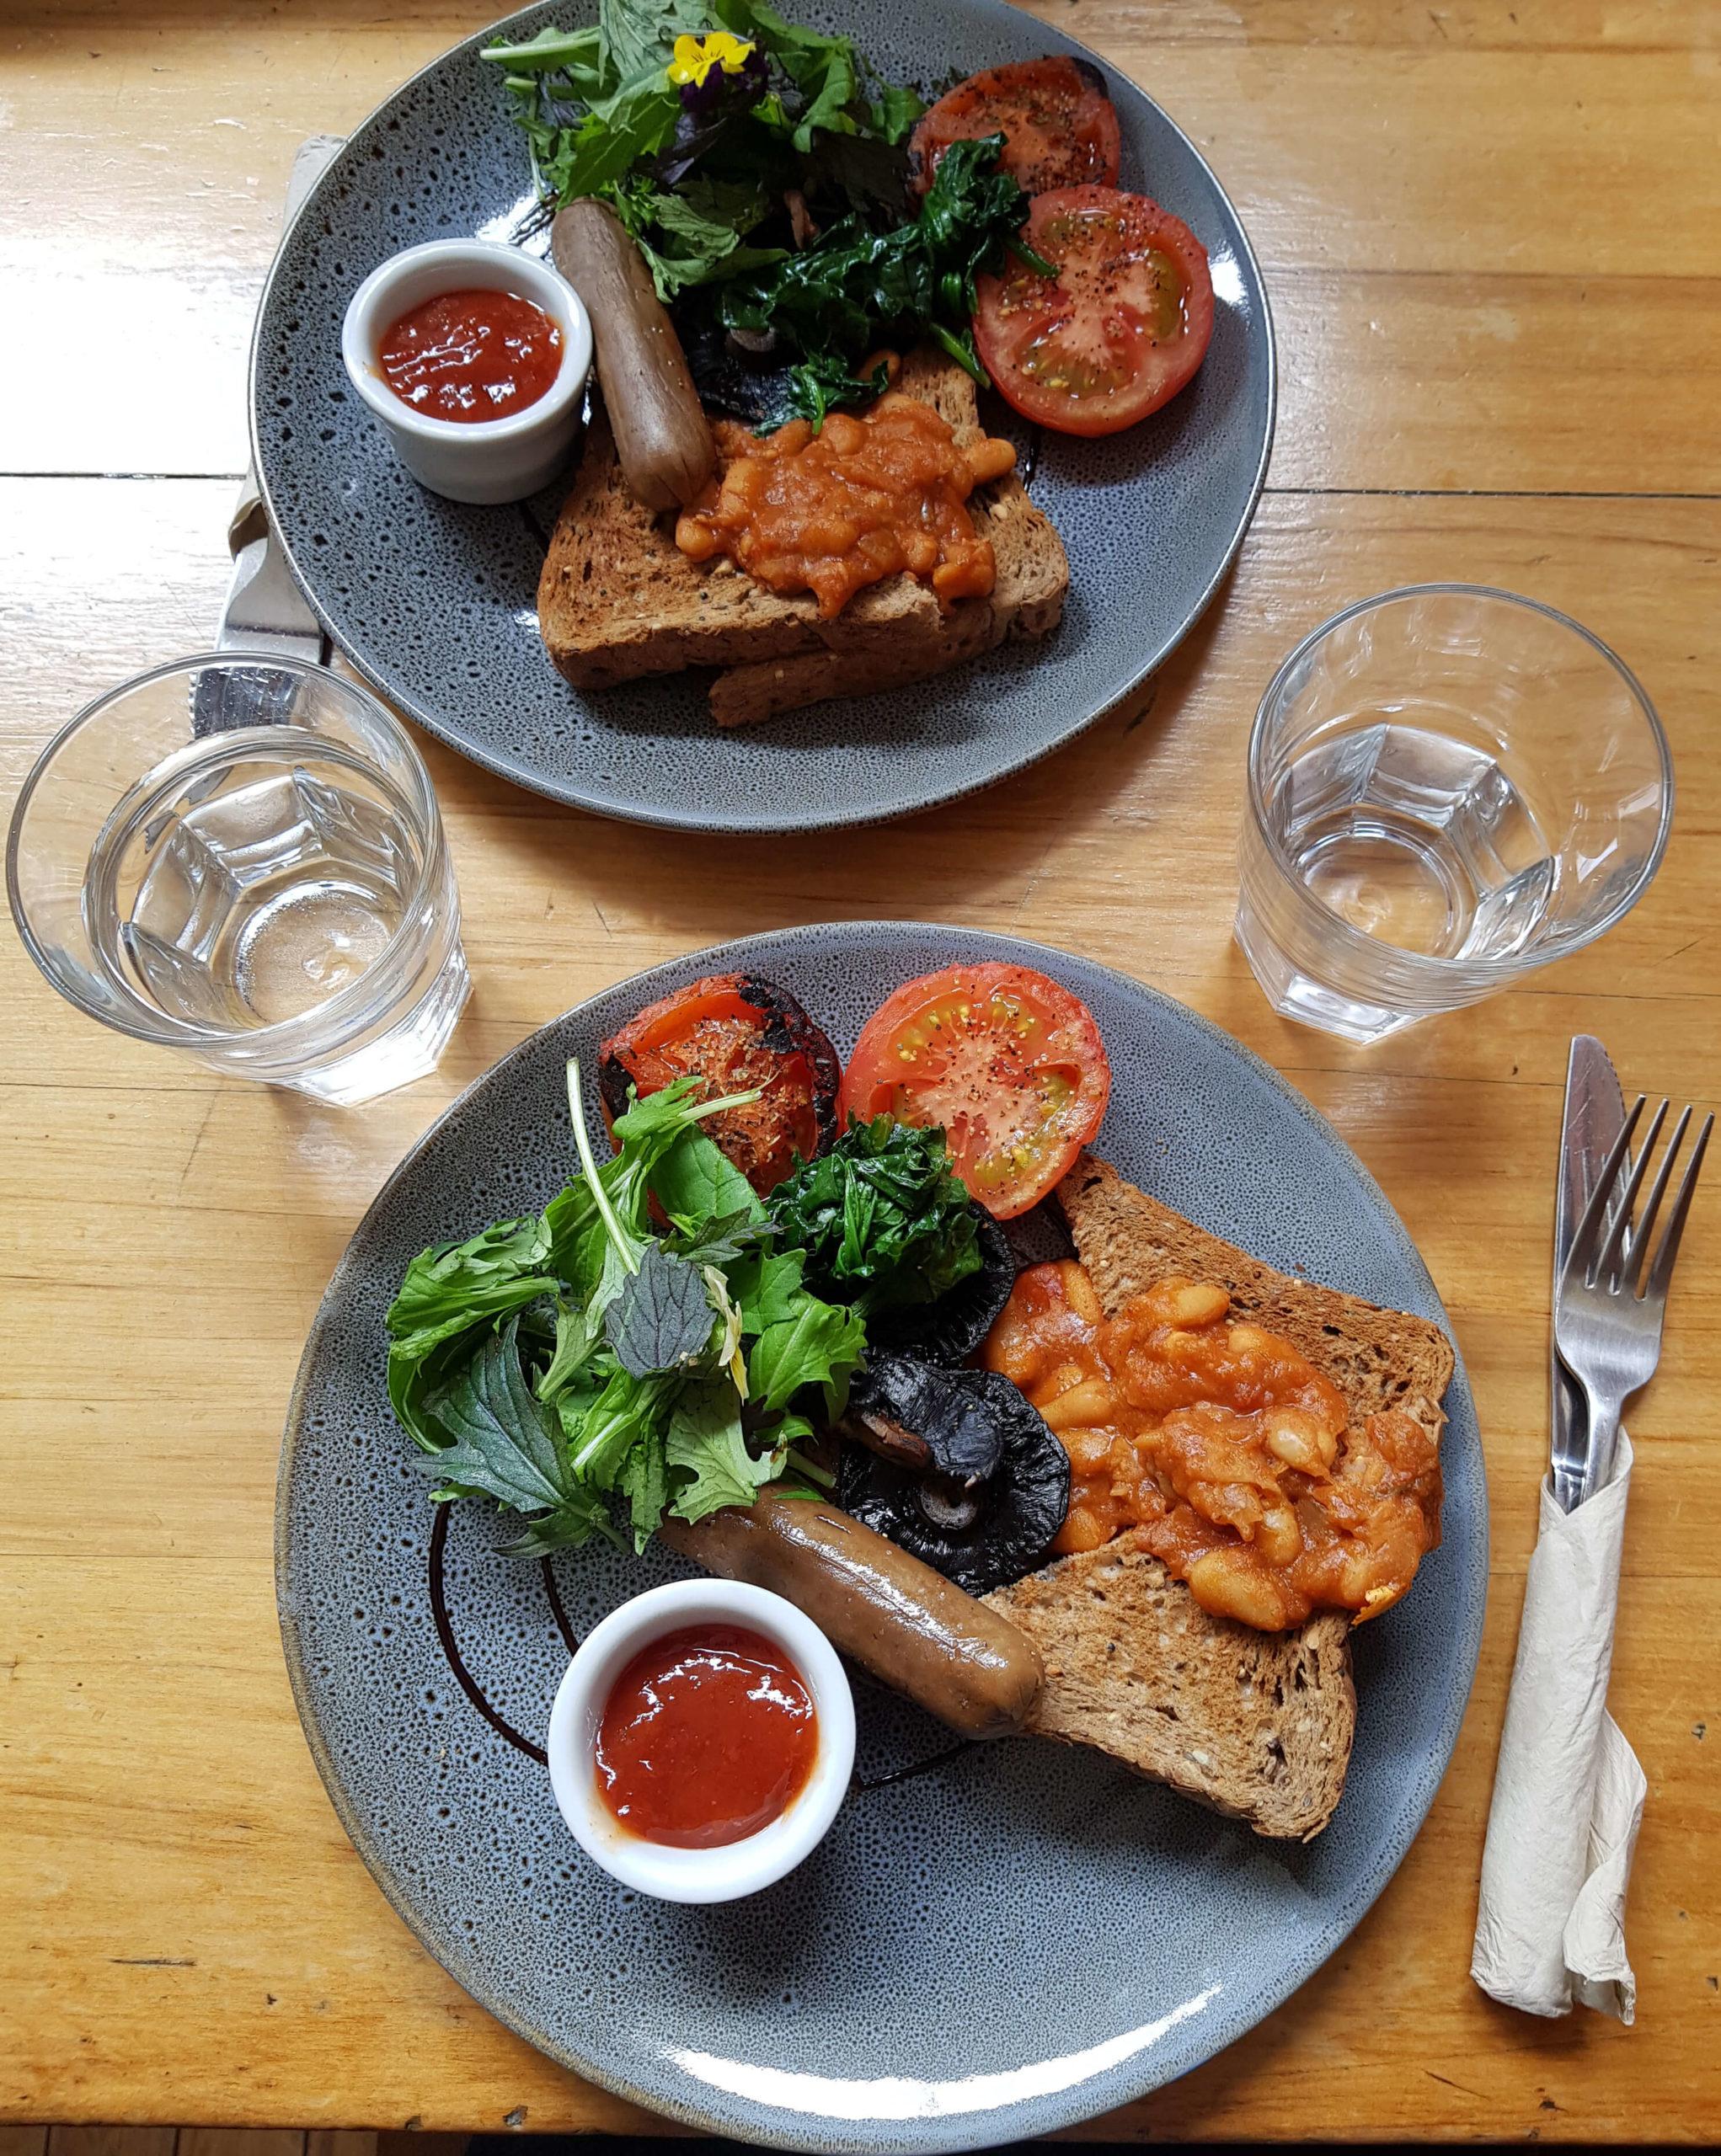 Vegan breakfast Potpourri vegeterian cafe